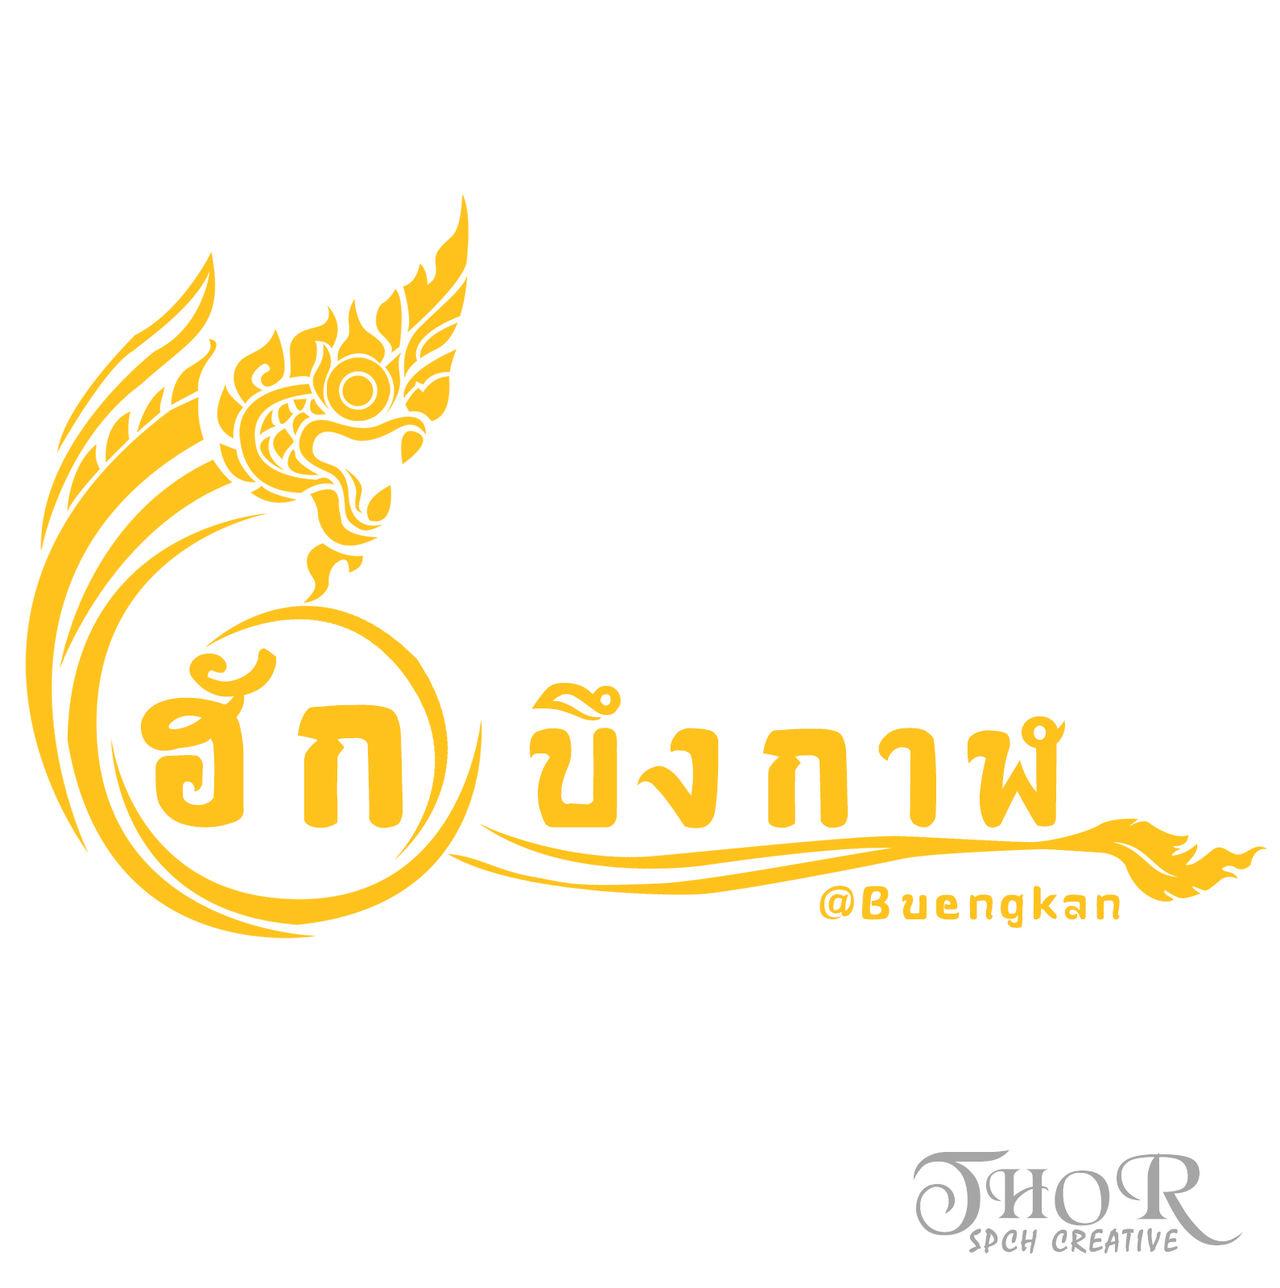 Design Photo Photoshop Picture Sale SPCHcreative SPCHstudio Thai